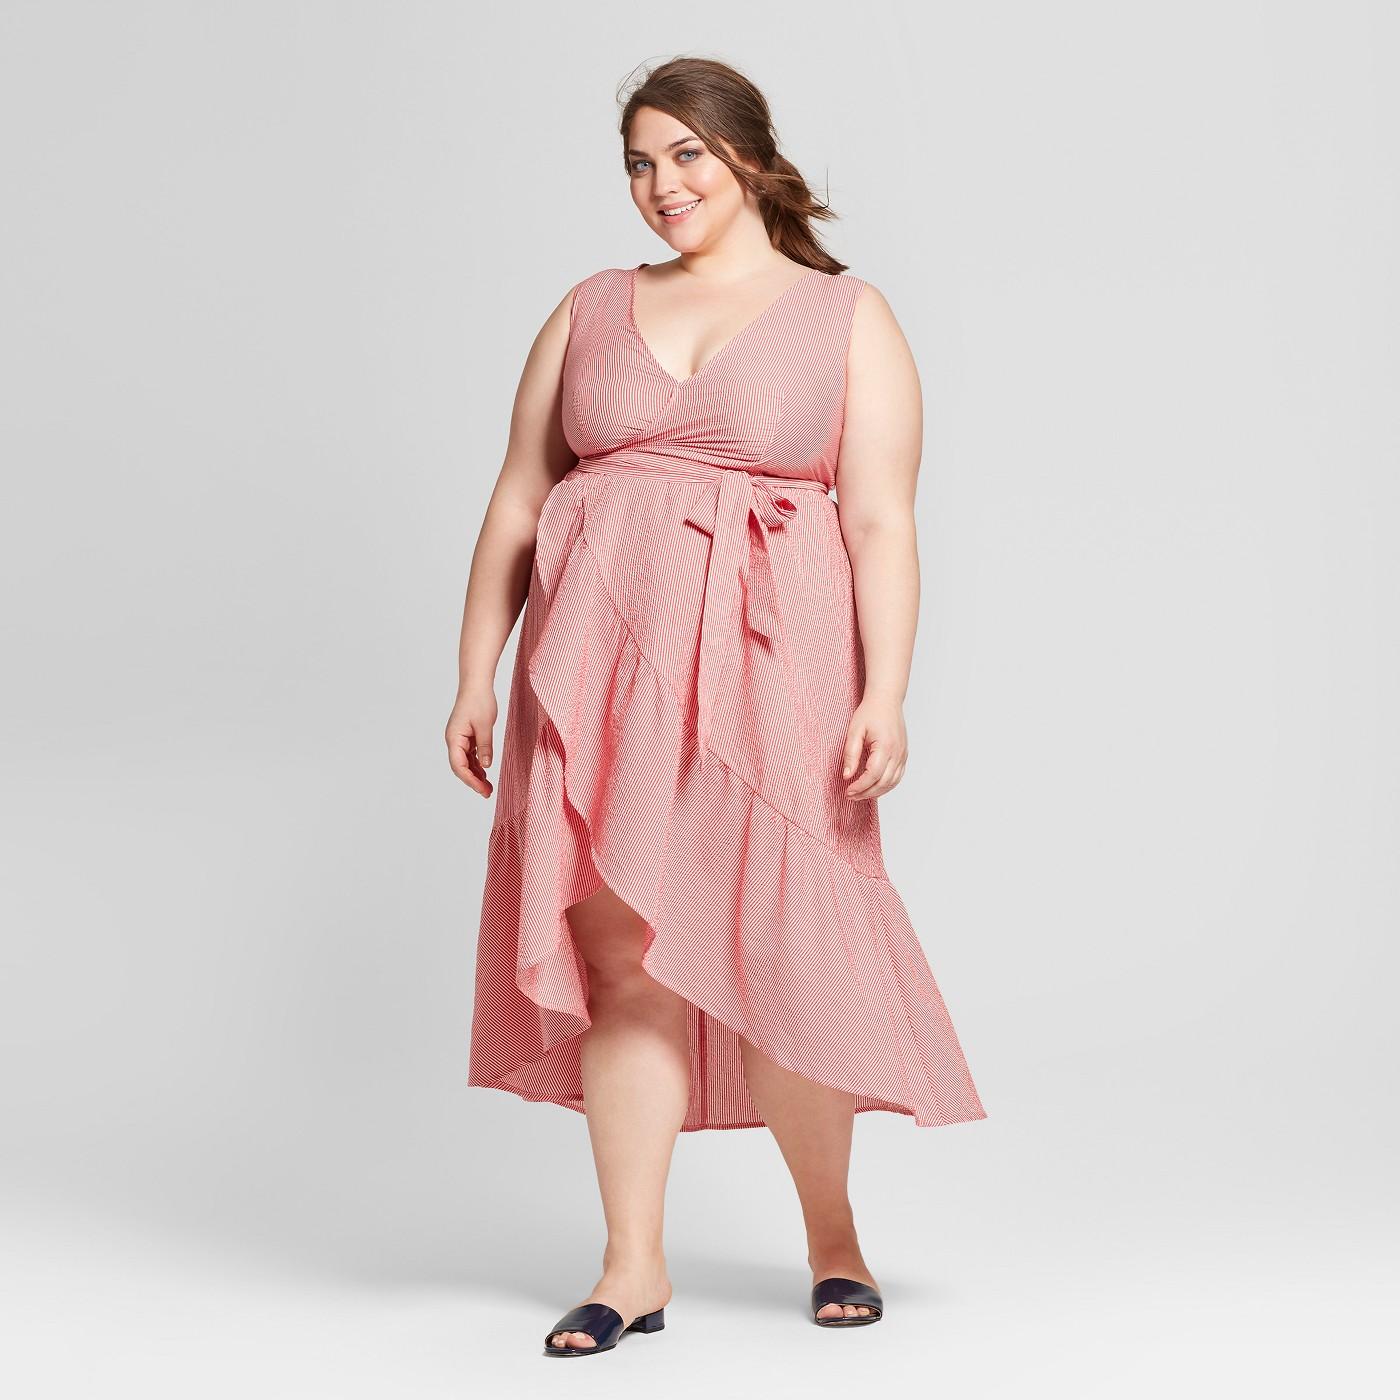 20 Wedding Guest Dresses You Can Wear Again Again Plus Size Wedding Guest Dresses Dresses Wedding Guest Dress [ 1400 x 1400 Pixel ]